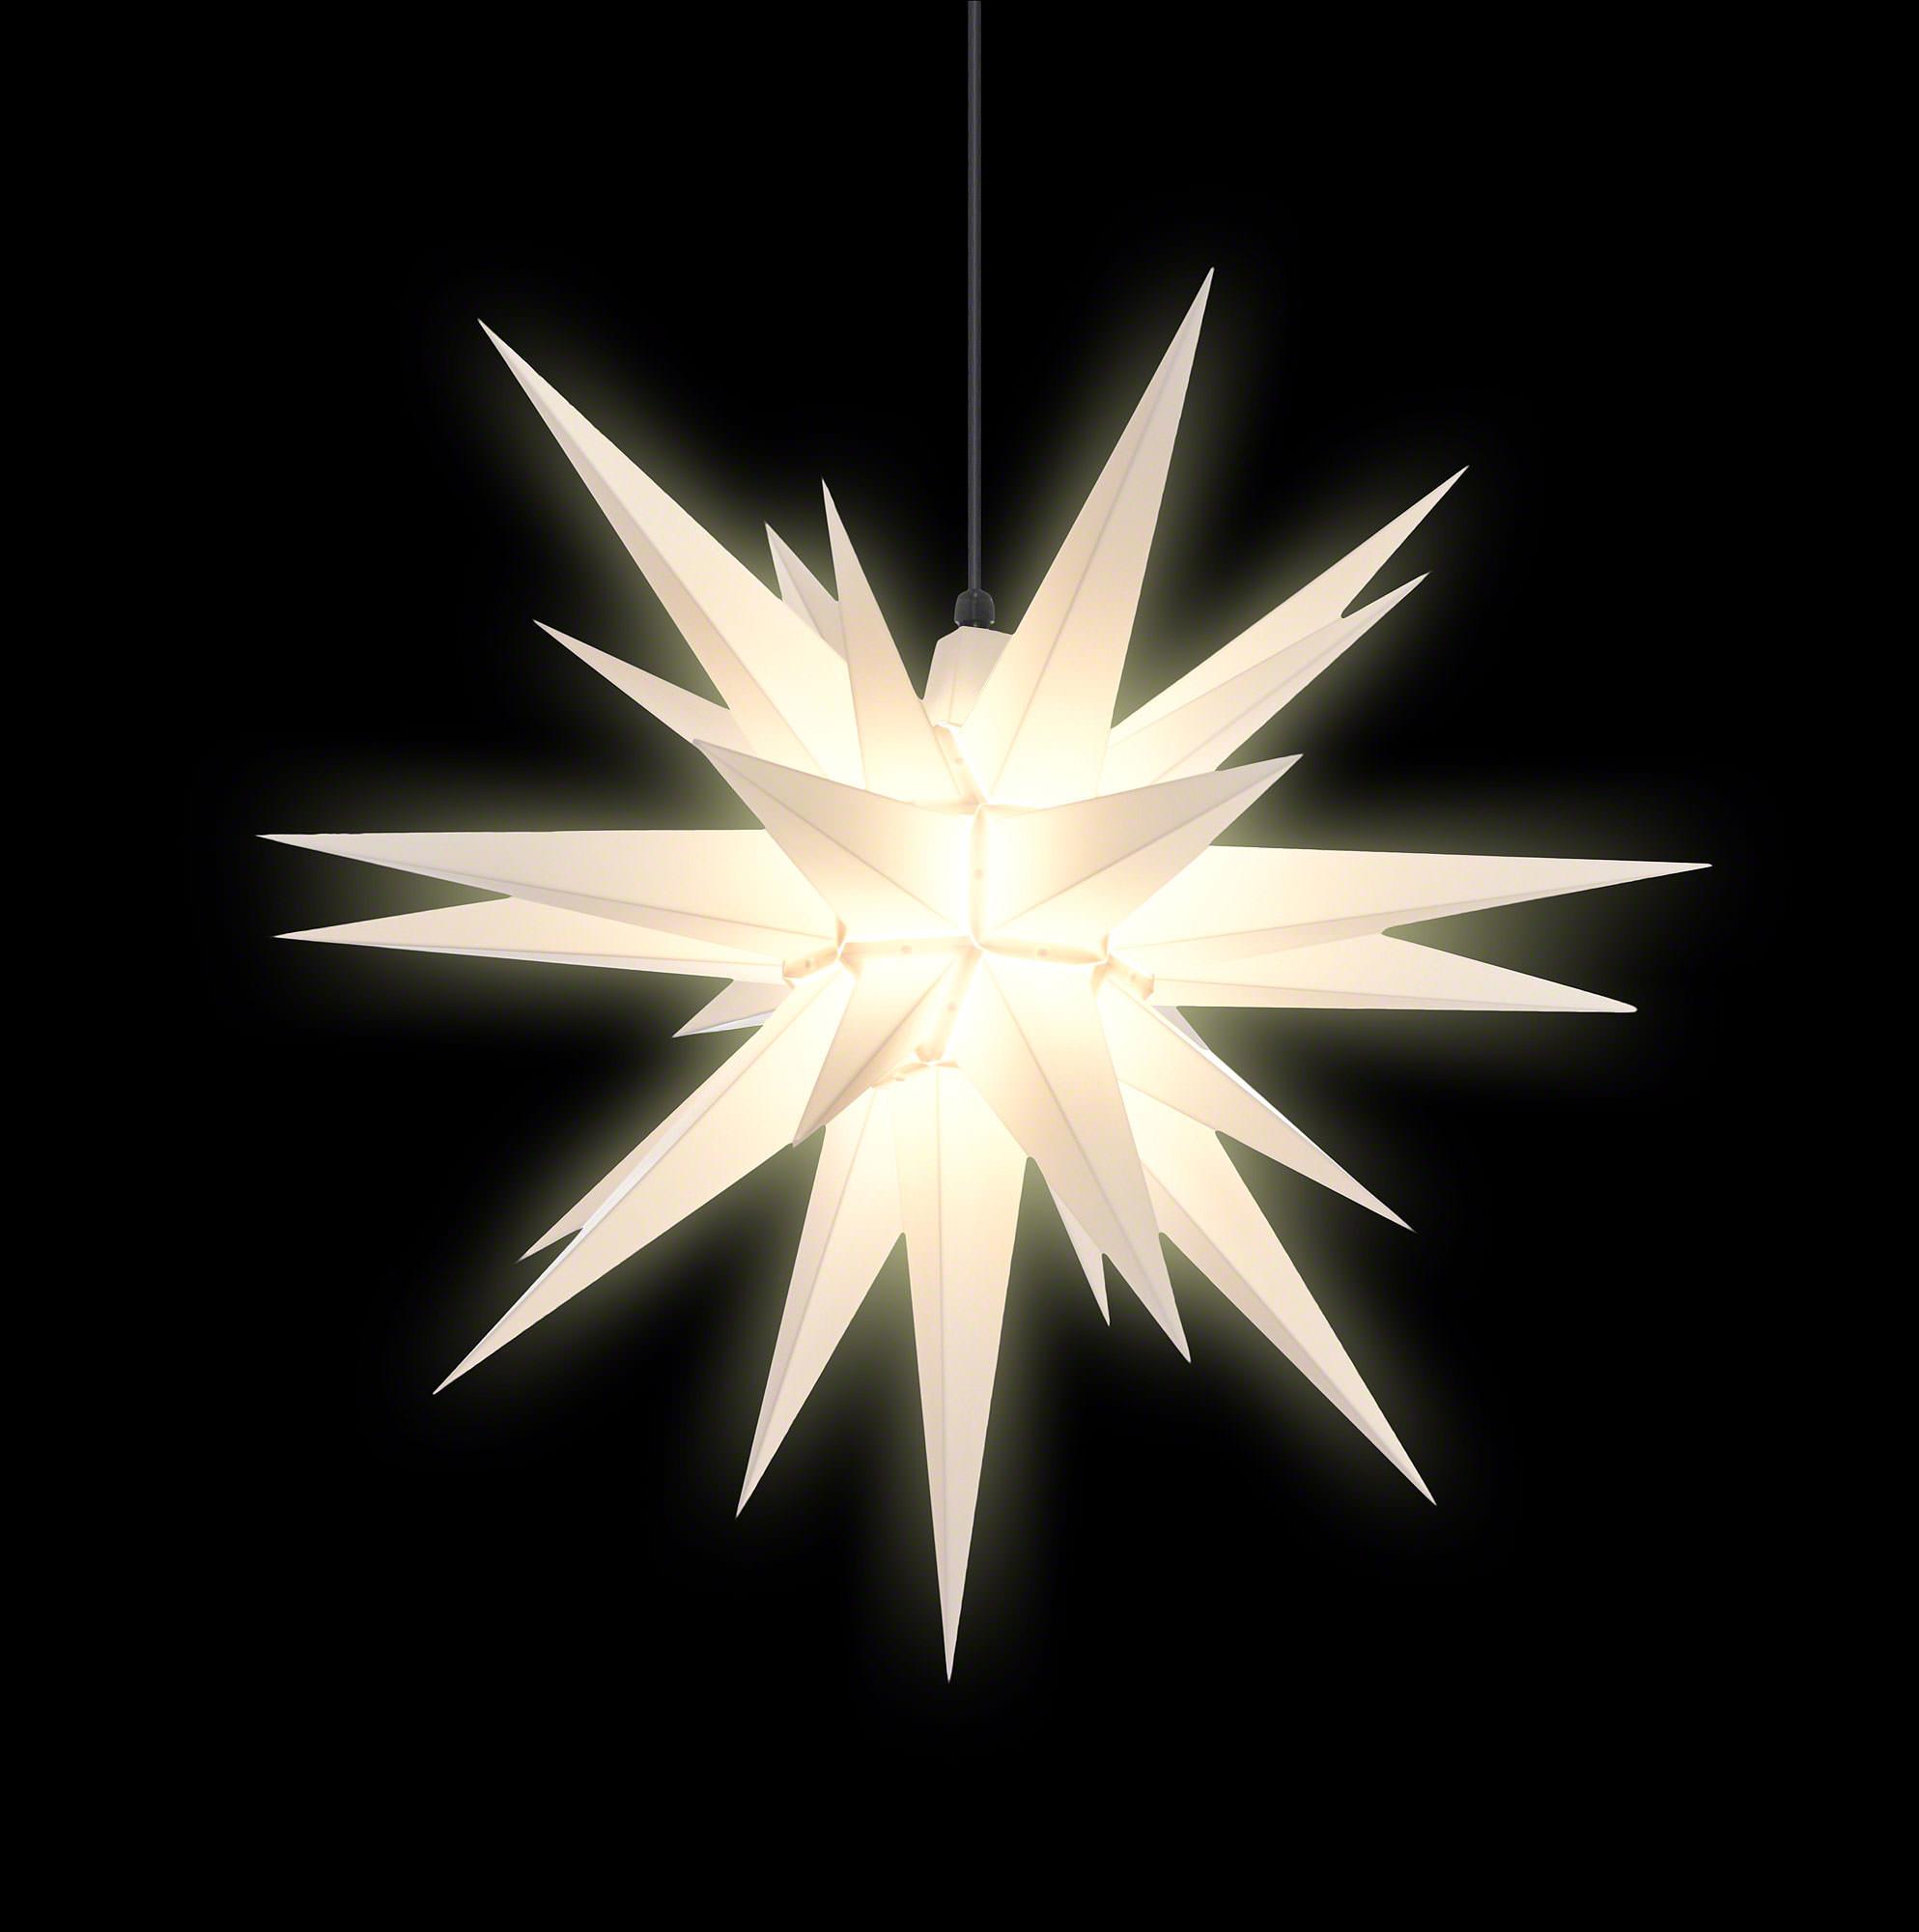 herrnhuter moravian star a7 white plastic 68cm 27in by herrnhuter sterne. Black Bedroom Furniture Sets. Home Design Ideas